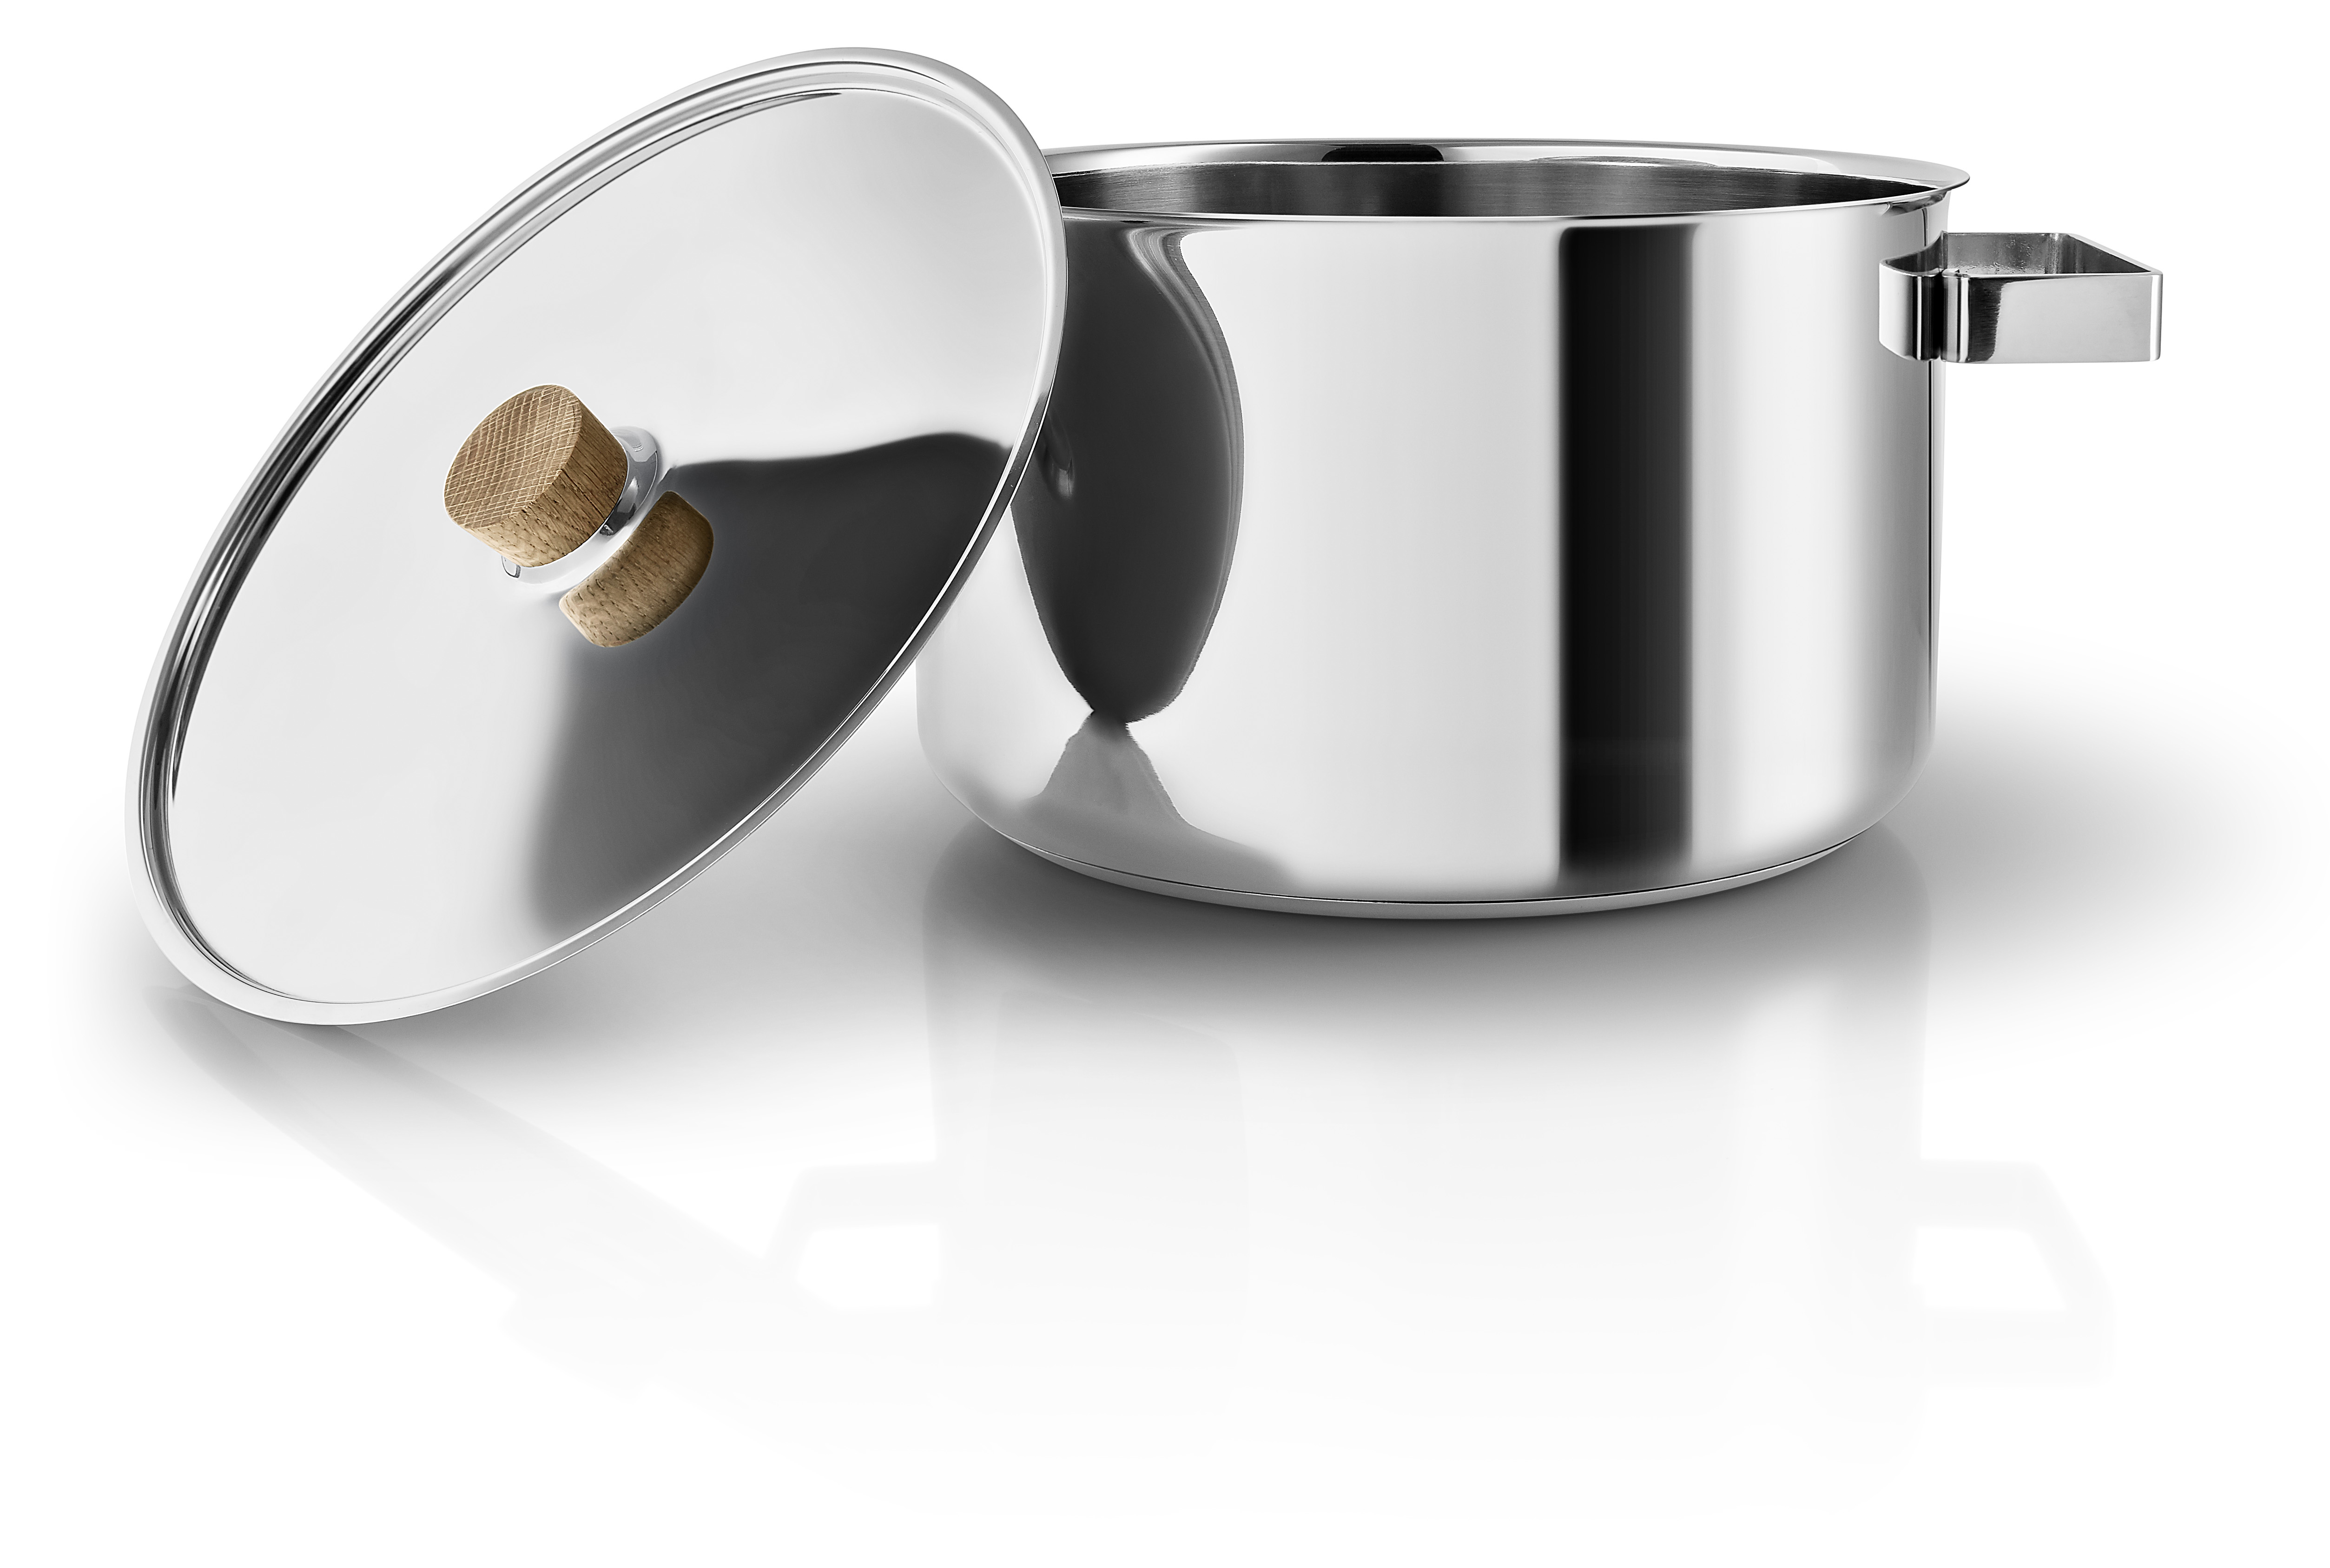 Eva Solo - Nordic Kitchen Pot 6 L (281260)